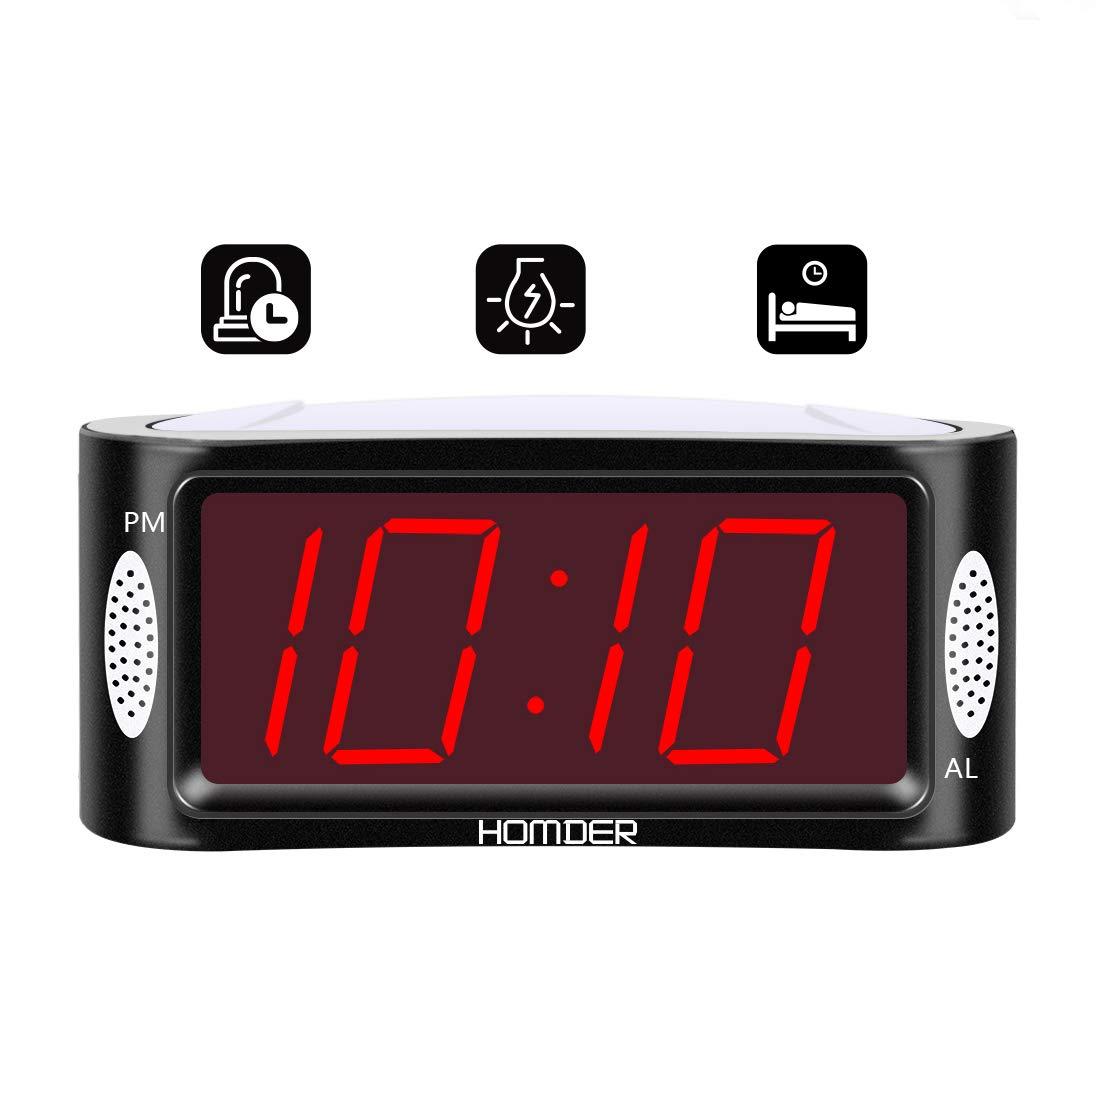 Homder Digital Alarm Clock Mains Powered with Night Light, Snooze & Full Range Brightness Dimming Function Desk and Shelf Clock